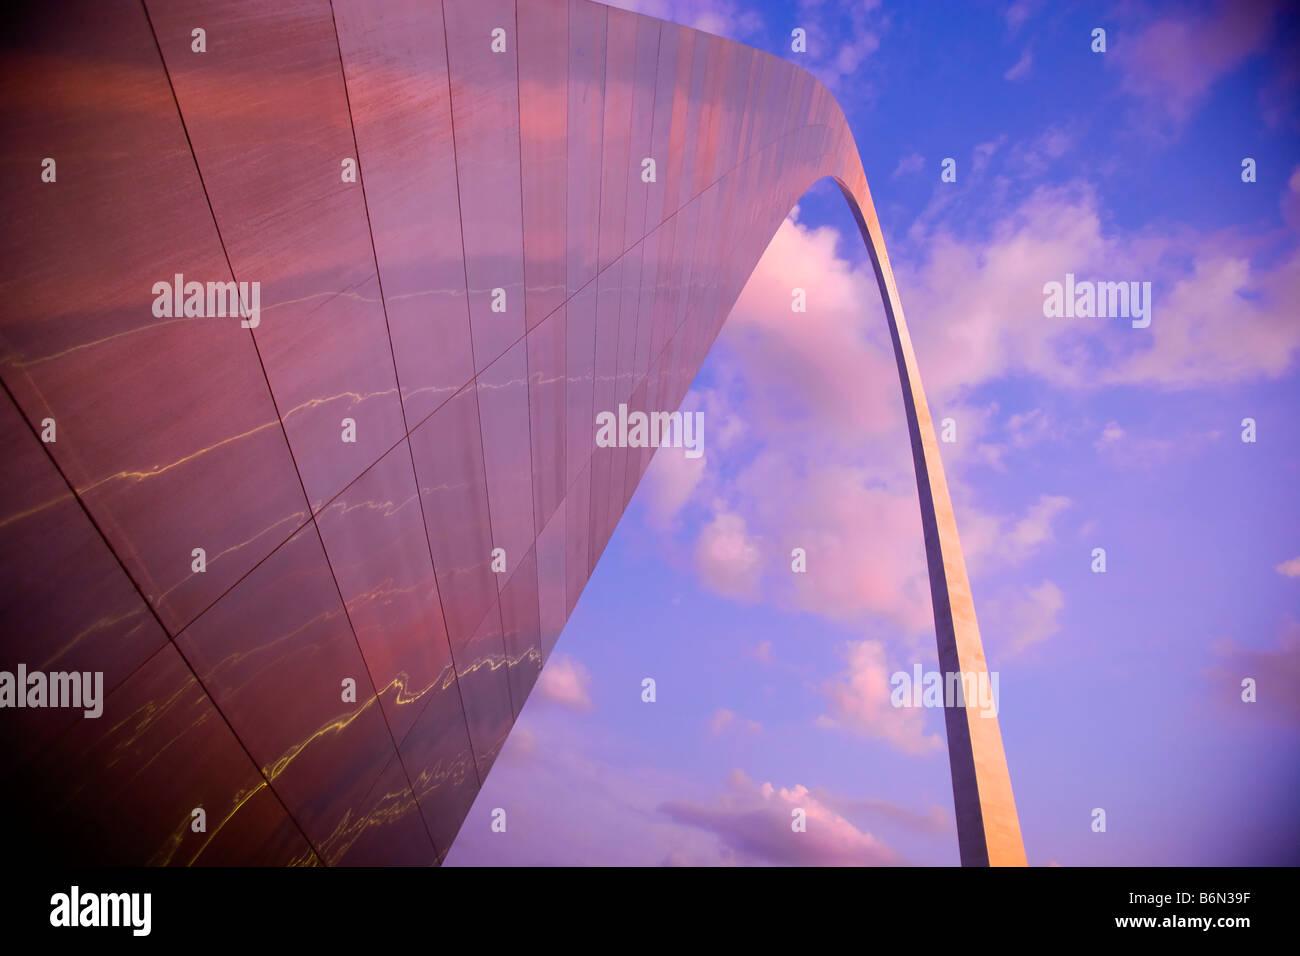 St. Louis Gateway Arch at twilight, St. Louis, Missouri - Stock Image